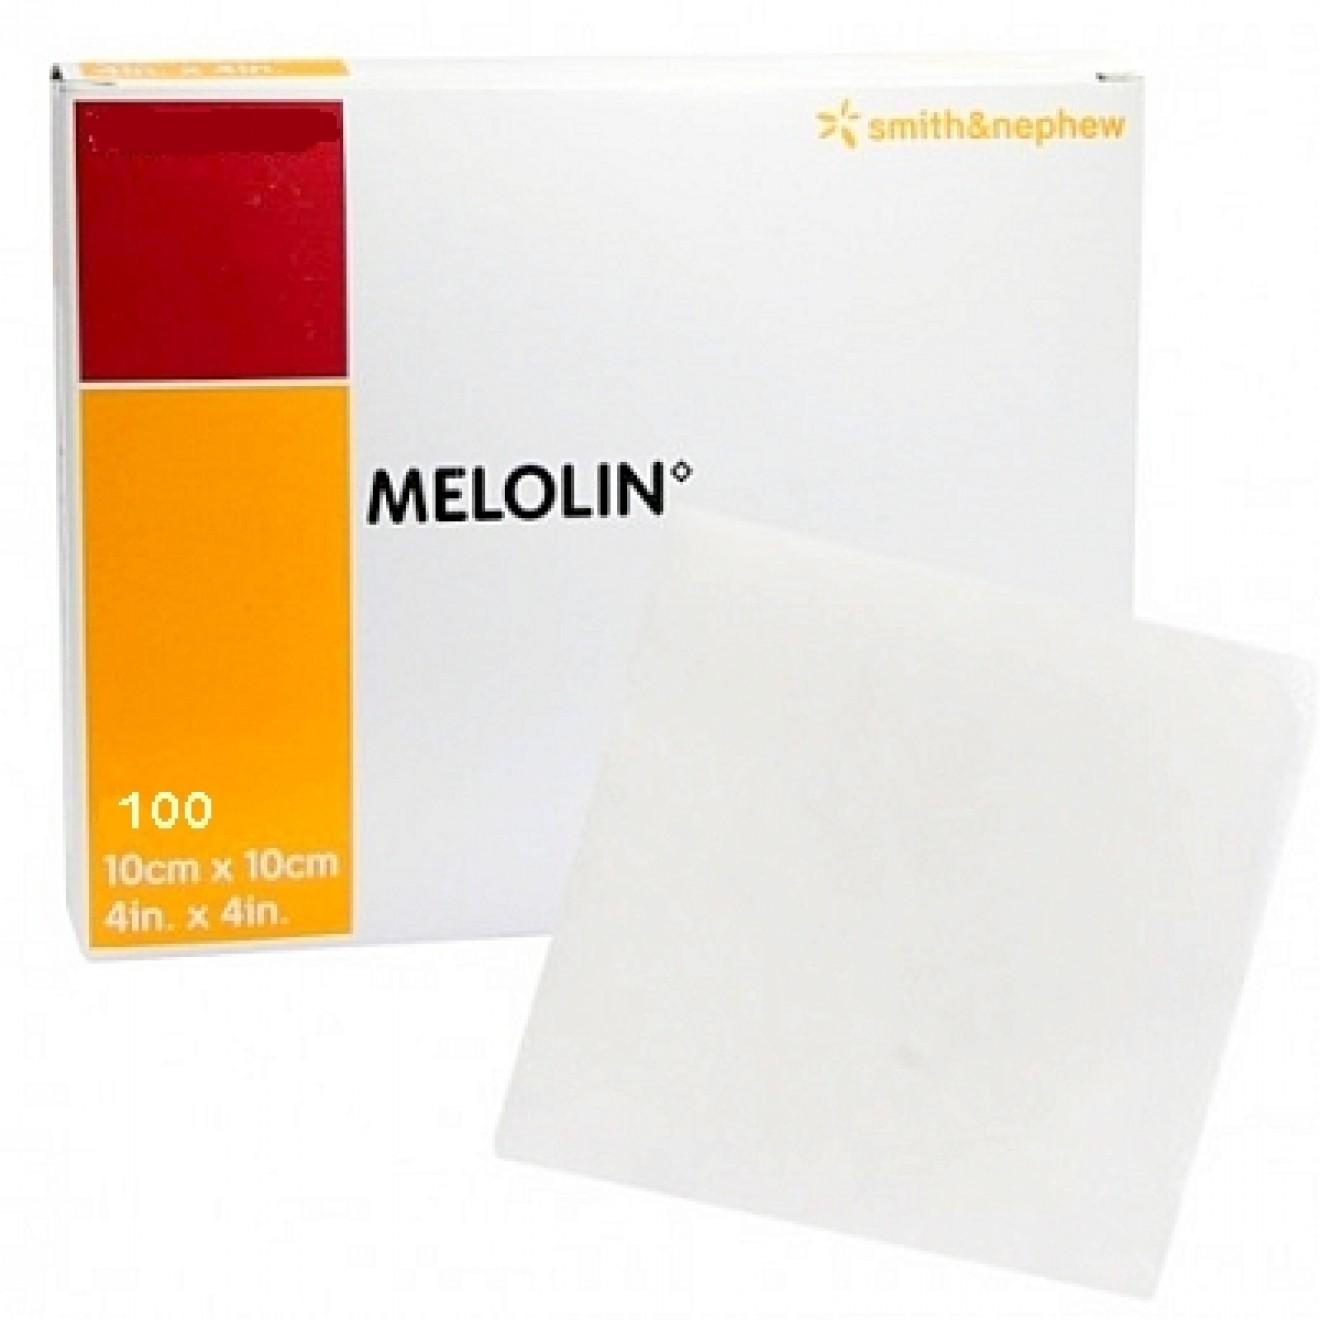 Smith Nephew GmbH MELOLIN 10x10 cm Wundauflagen steril 100 ST 02782343